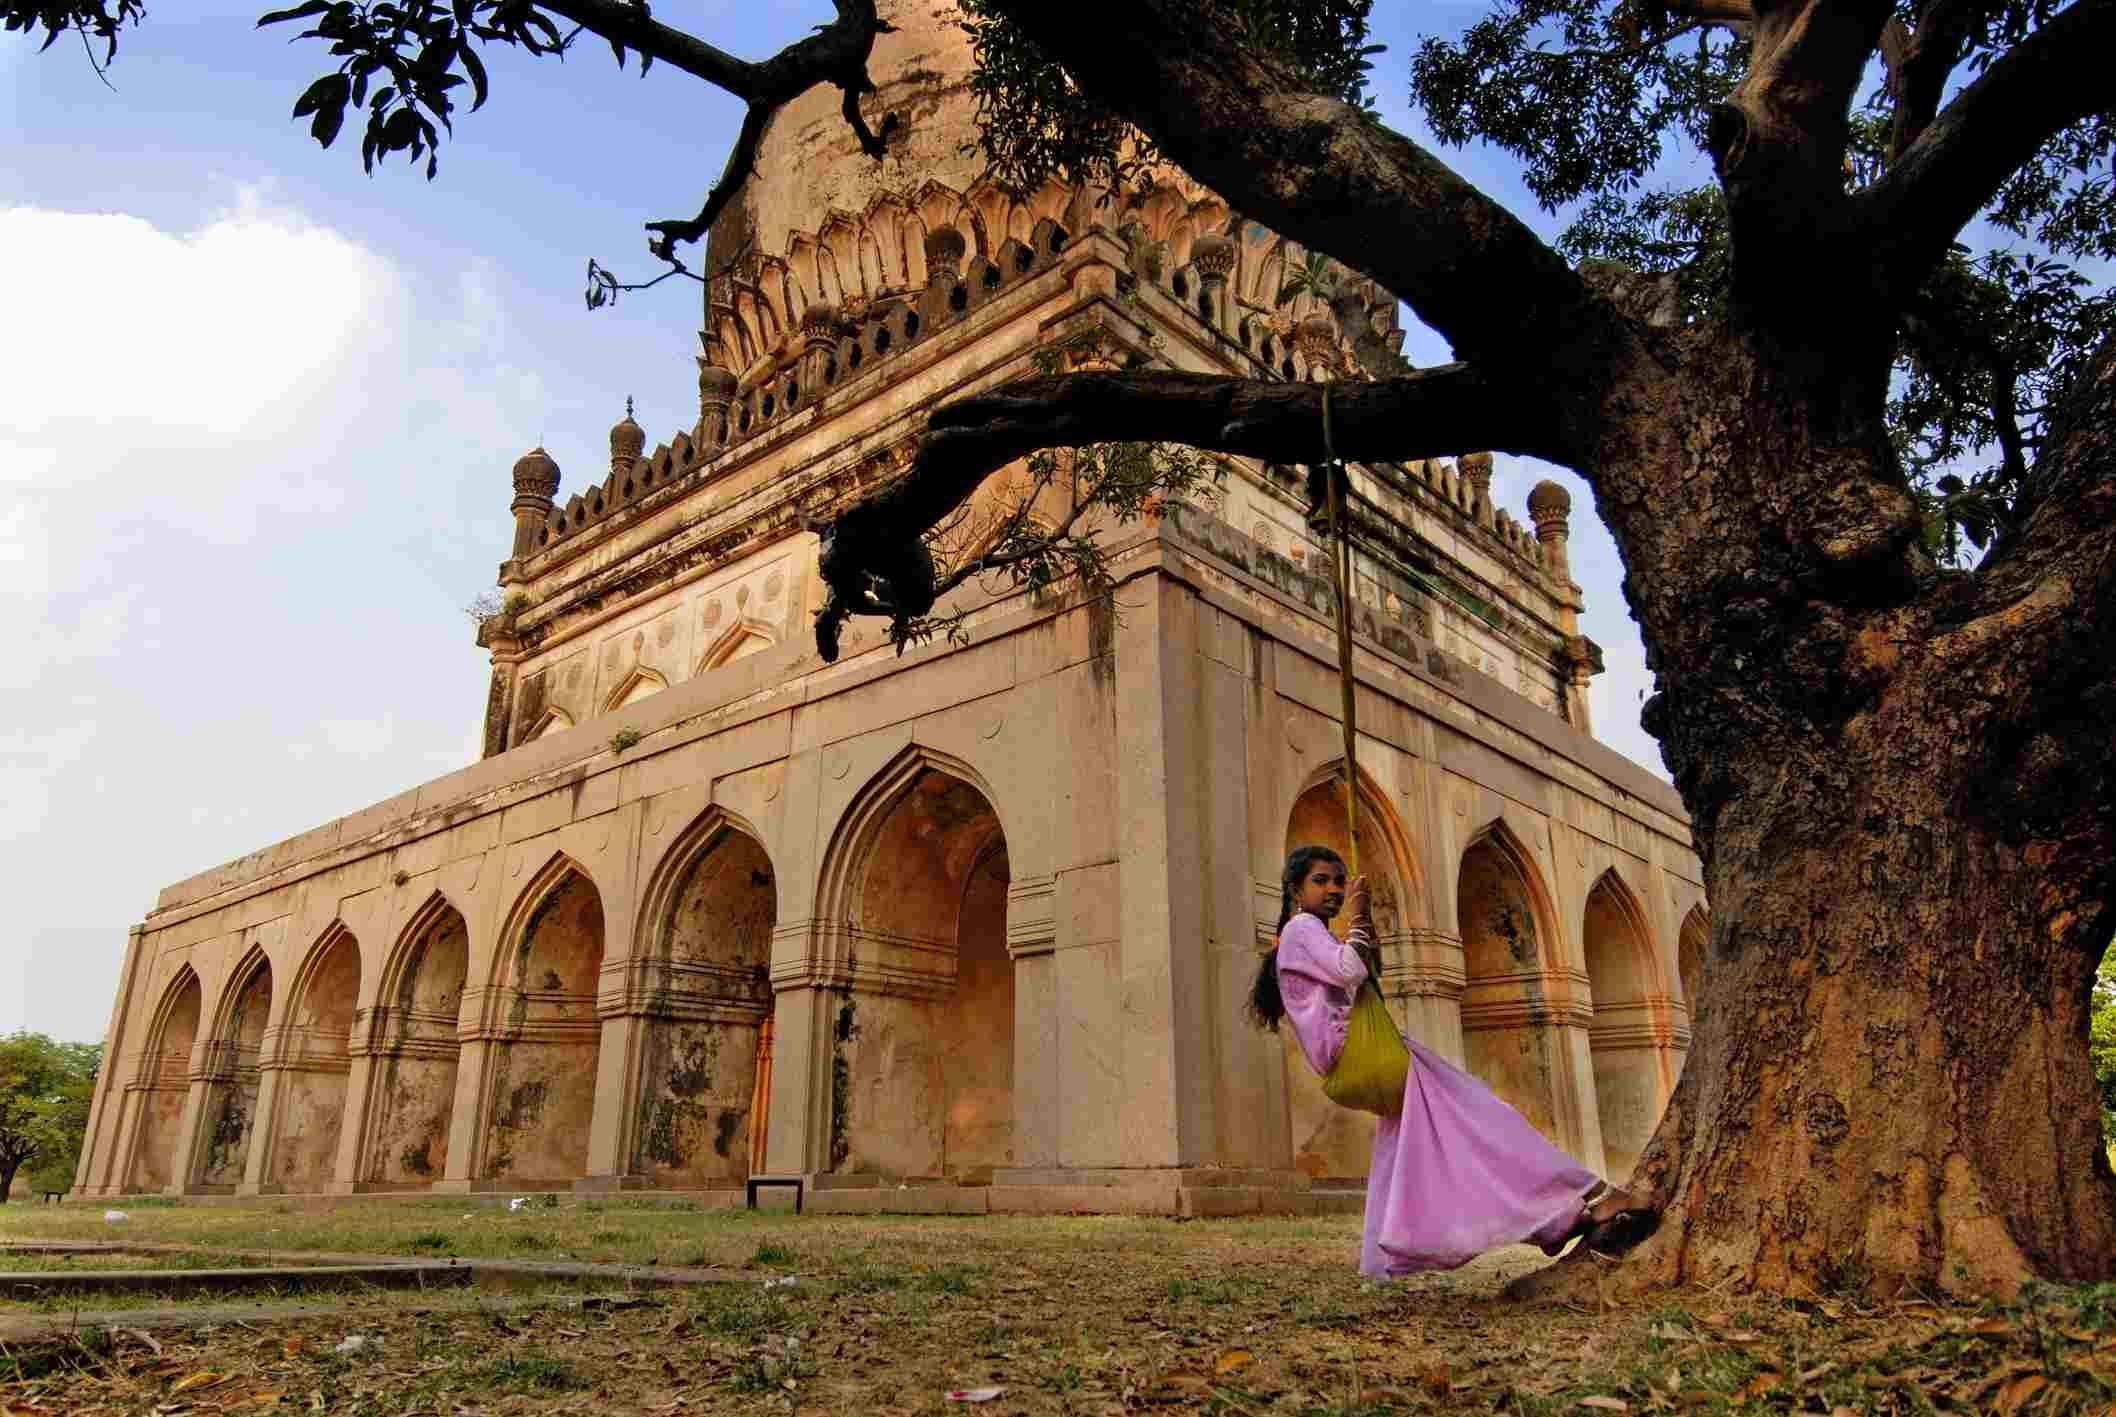 Girl on swing at tombs of Qutab Shahi kings.